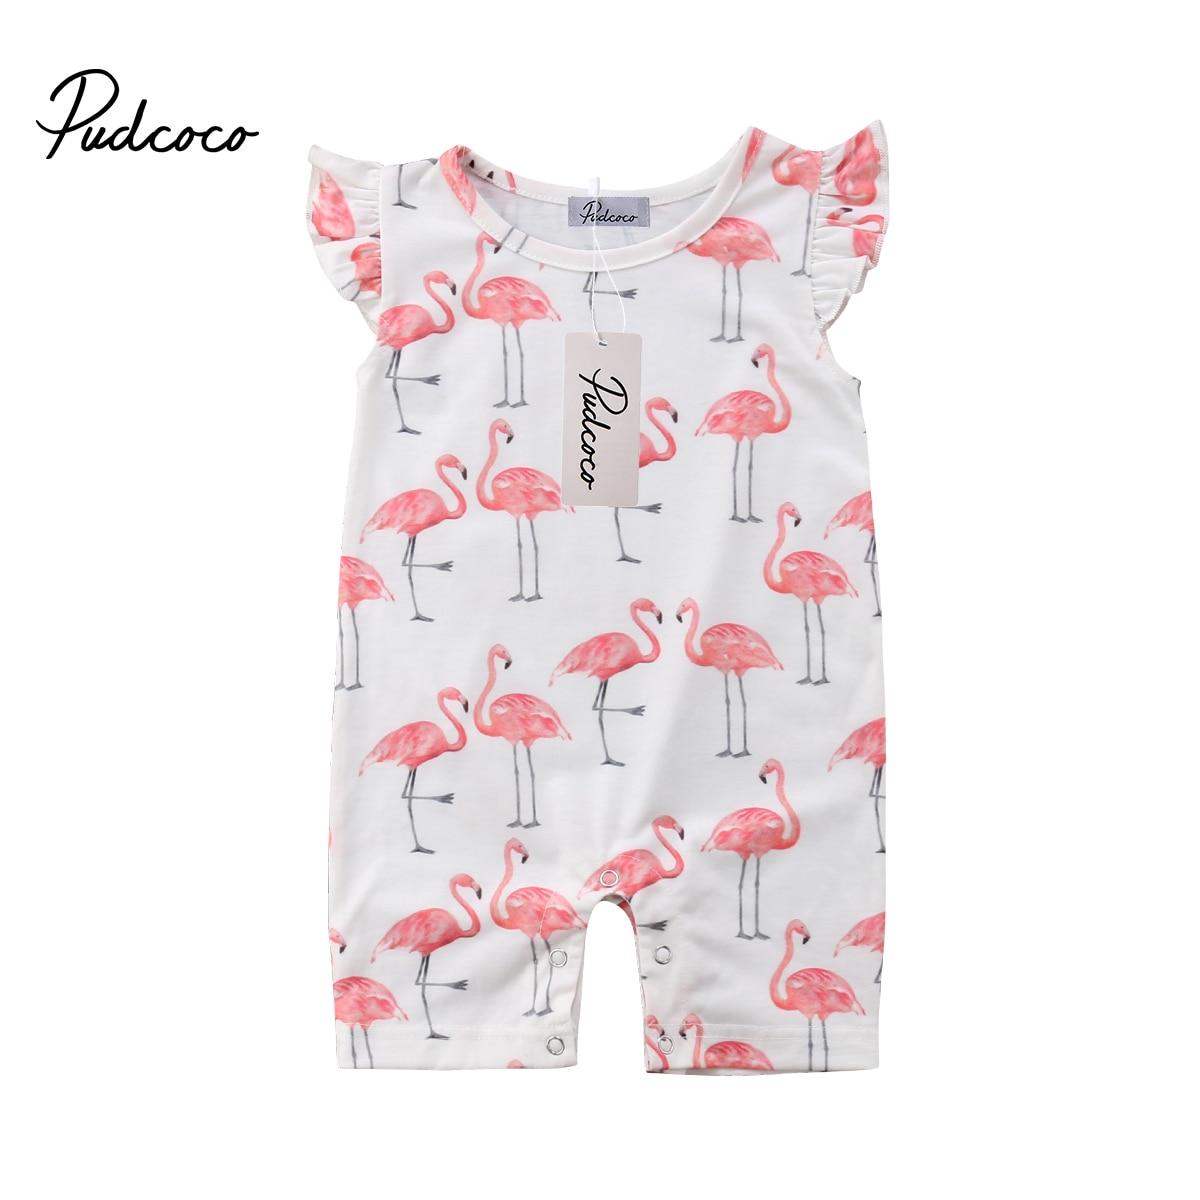 Cute Baby Rompers Toddler Kids Baby Girl Flamingo Jumpsuit Short